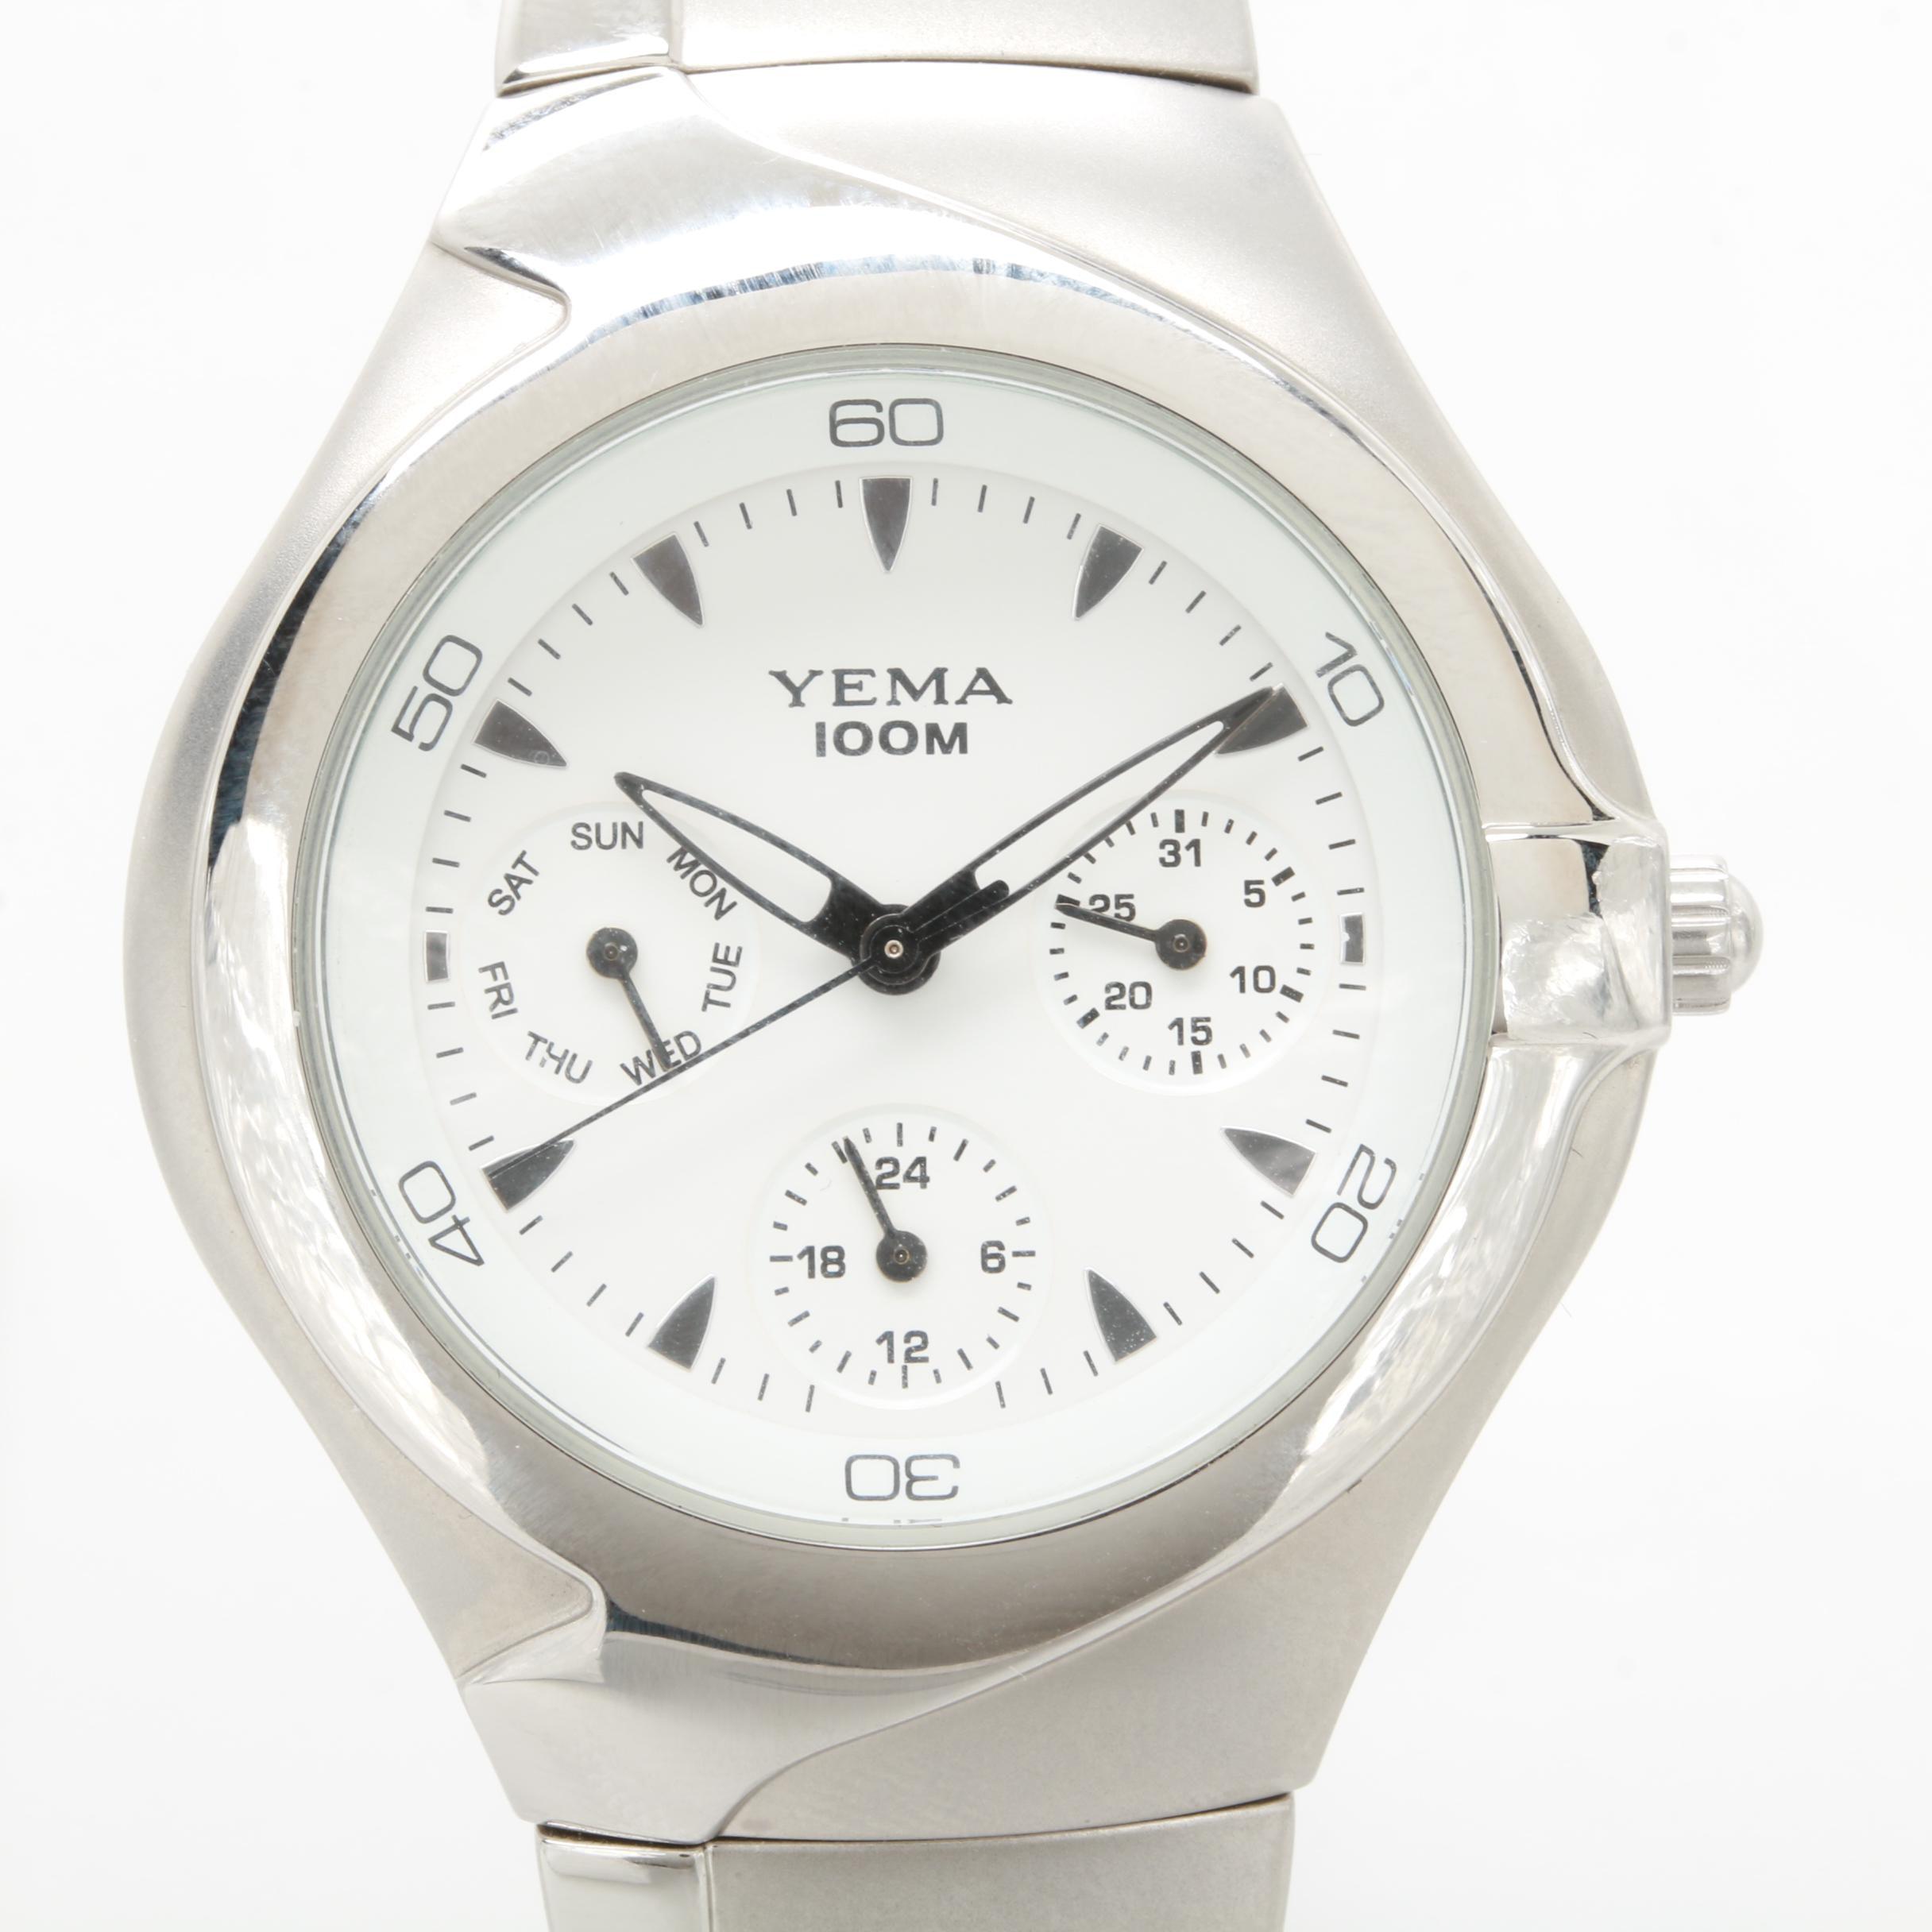 Yema Model YA244 Multi-Function Quartz Watch